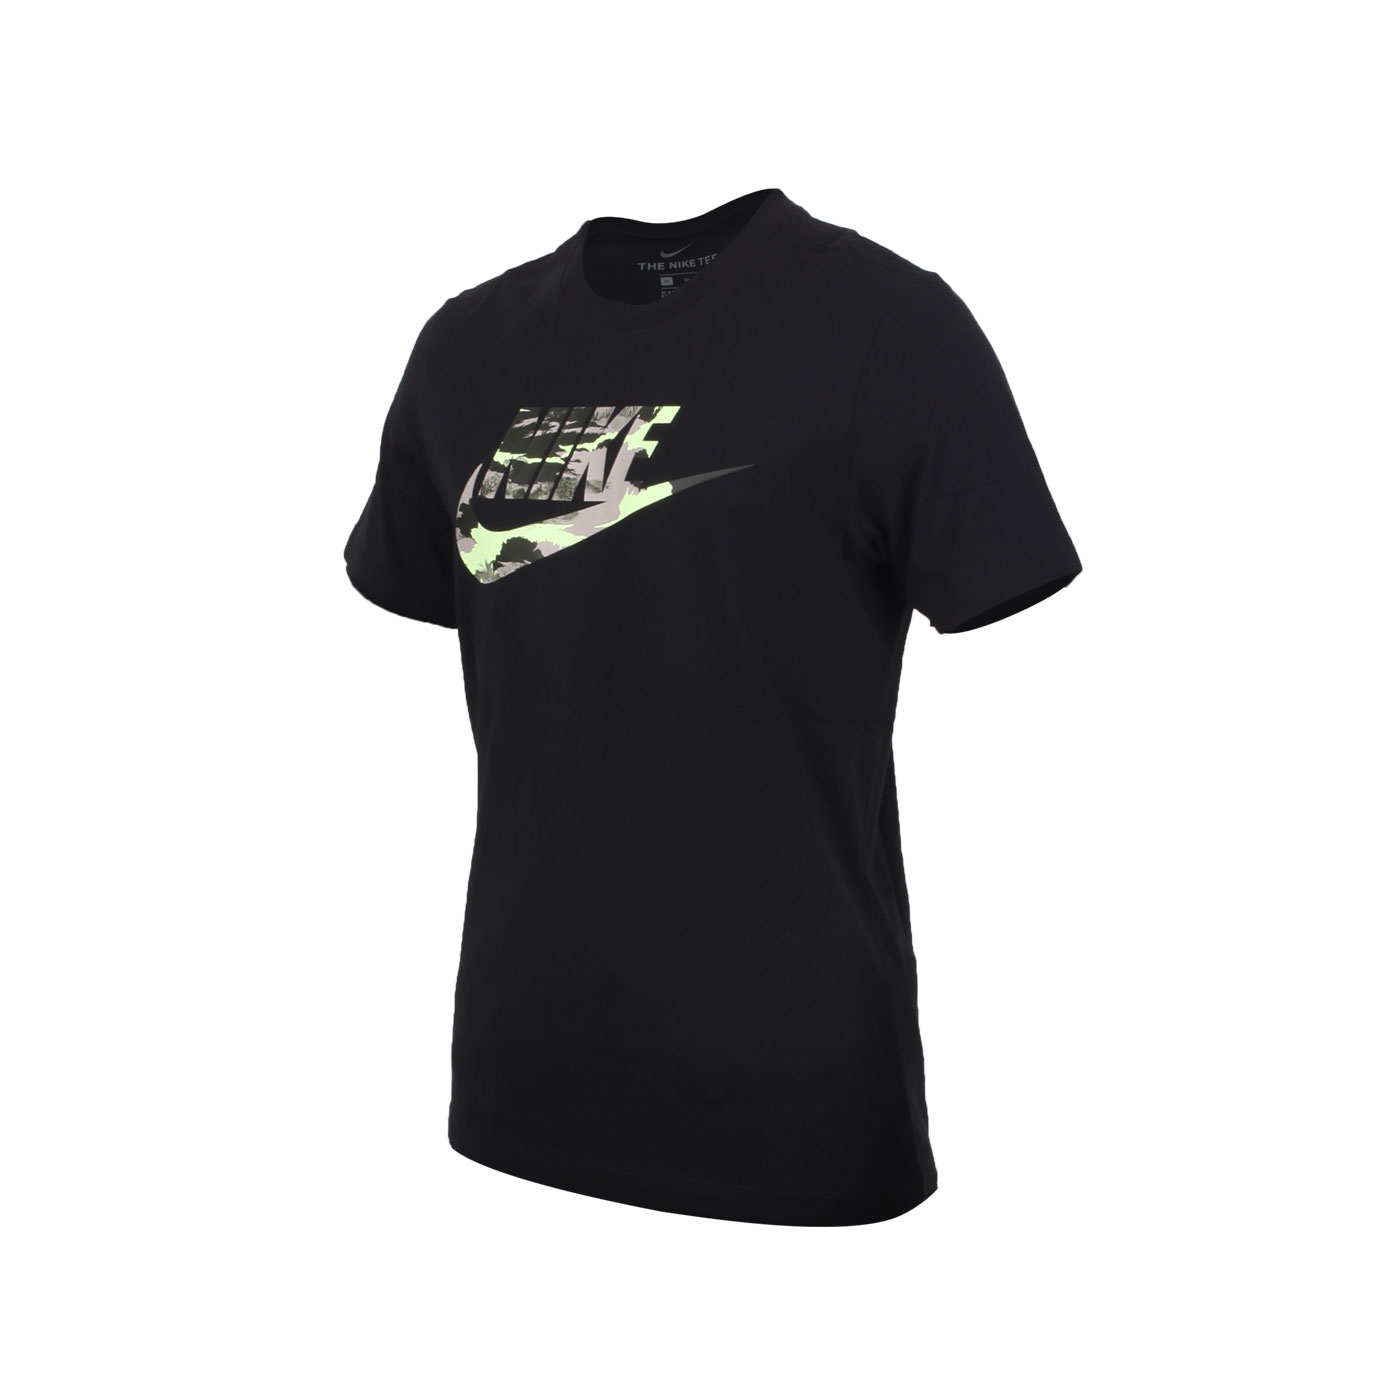 NIKE 男款短袖T恤 CU8915-010 - 黑灰綠